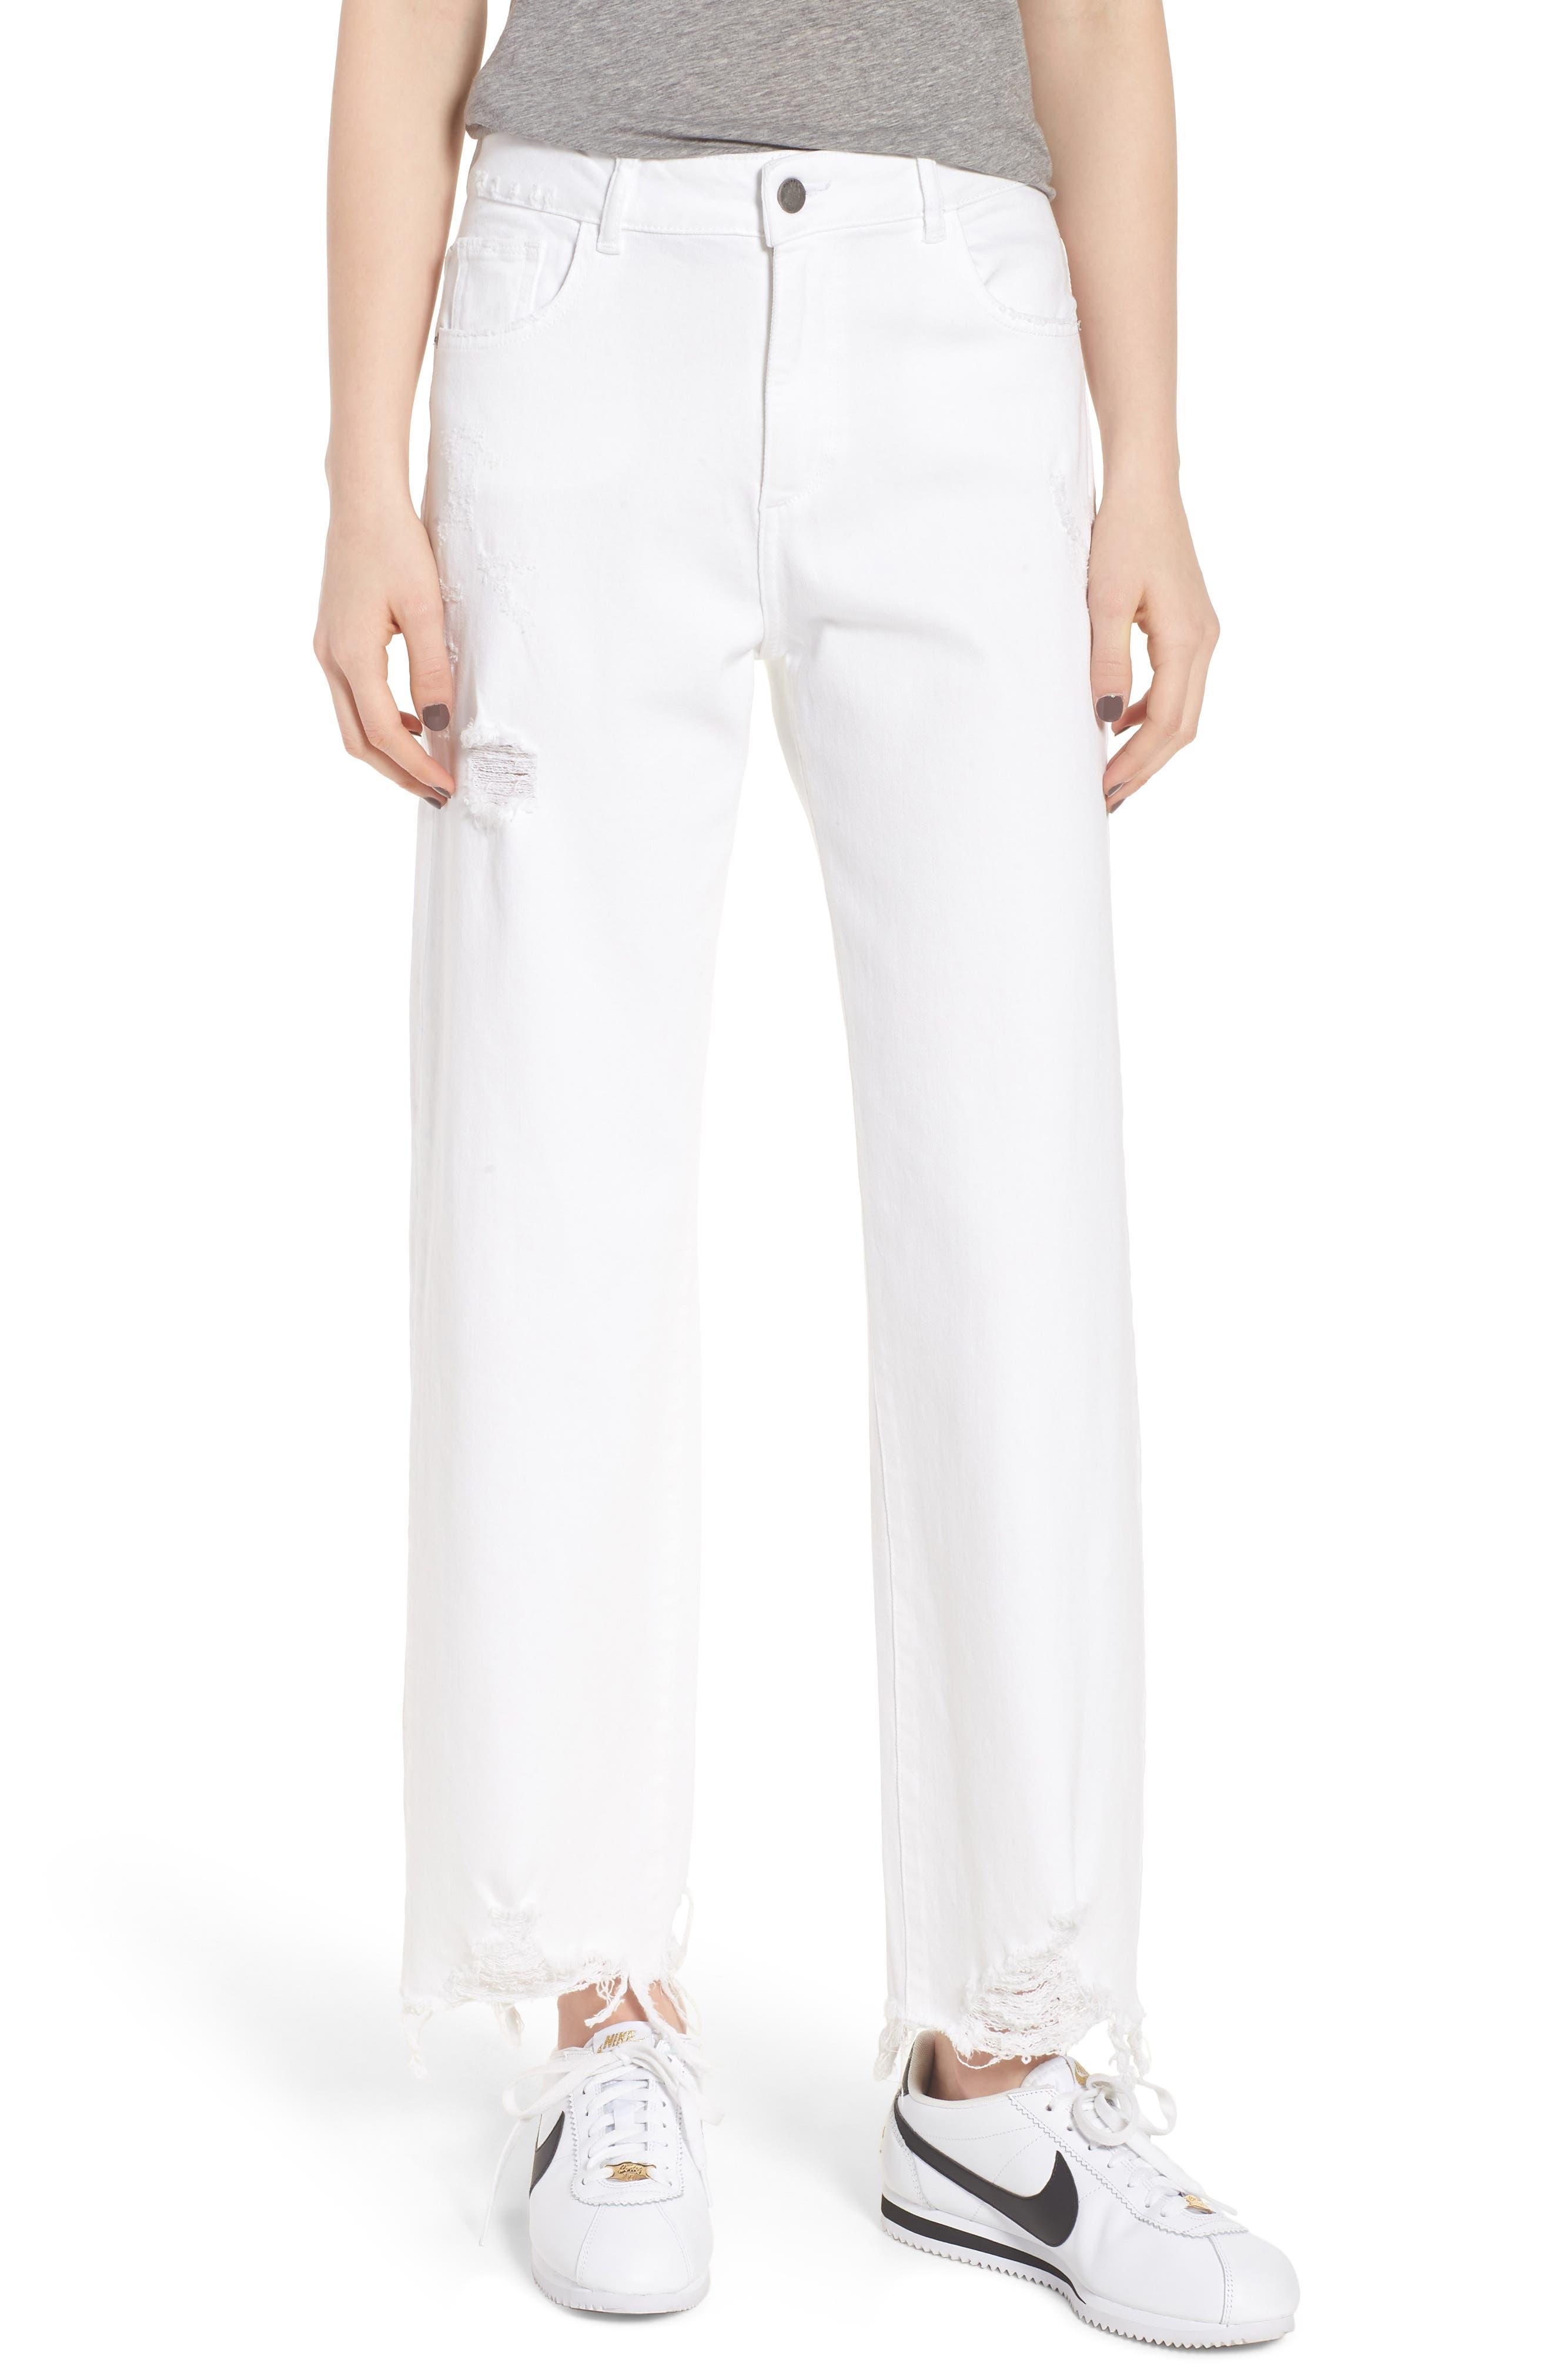 Hepburn High Waist Wide Leg Jeans,                             Main thumbnail 1, color,                             Sacramento